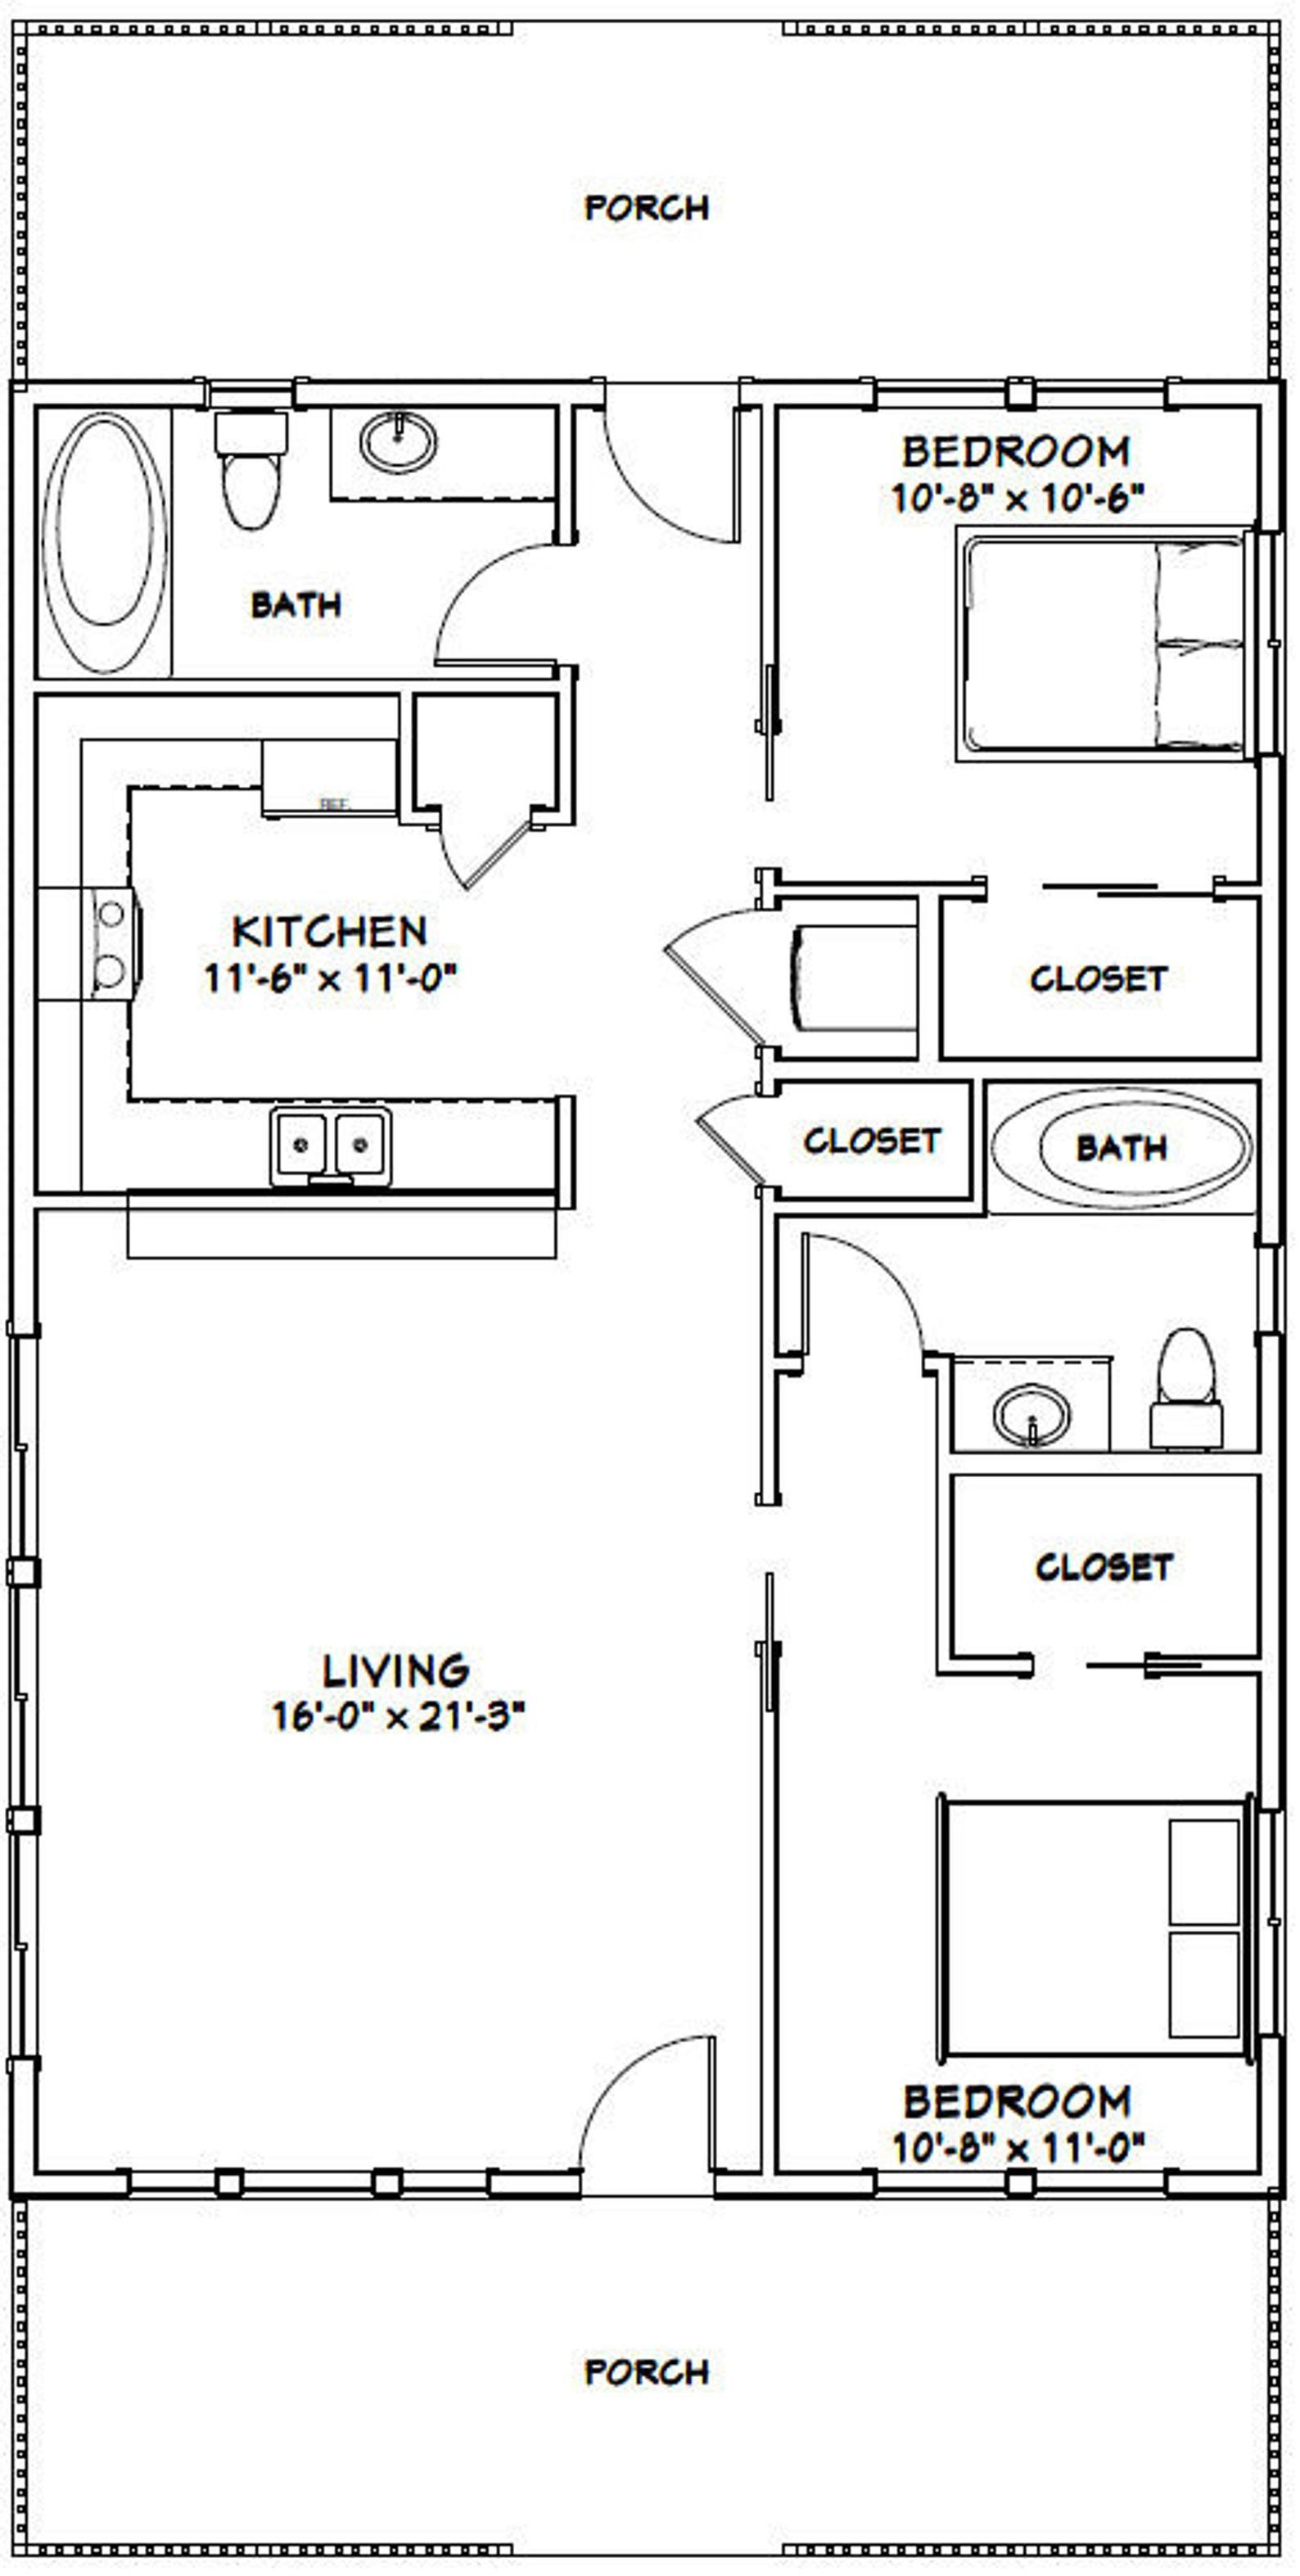 28x40 House 2 Bedroom 2 Bath 1 120 Sq Ft Pdf Floor Plan Instant Download Model 1a Tiny House Floor Plans Small House Floor Plans Barndominium Floor Plans